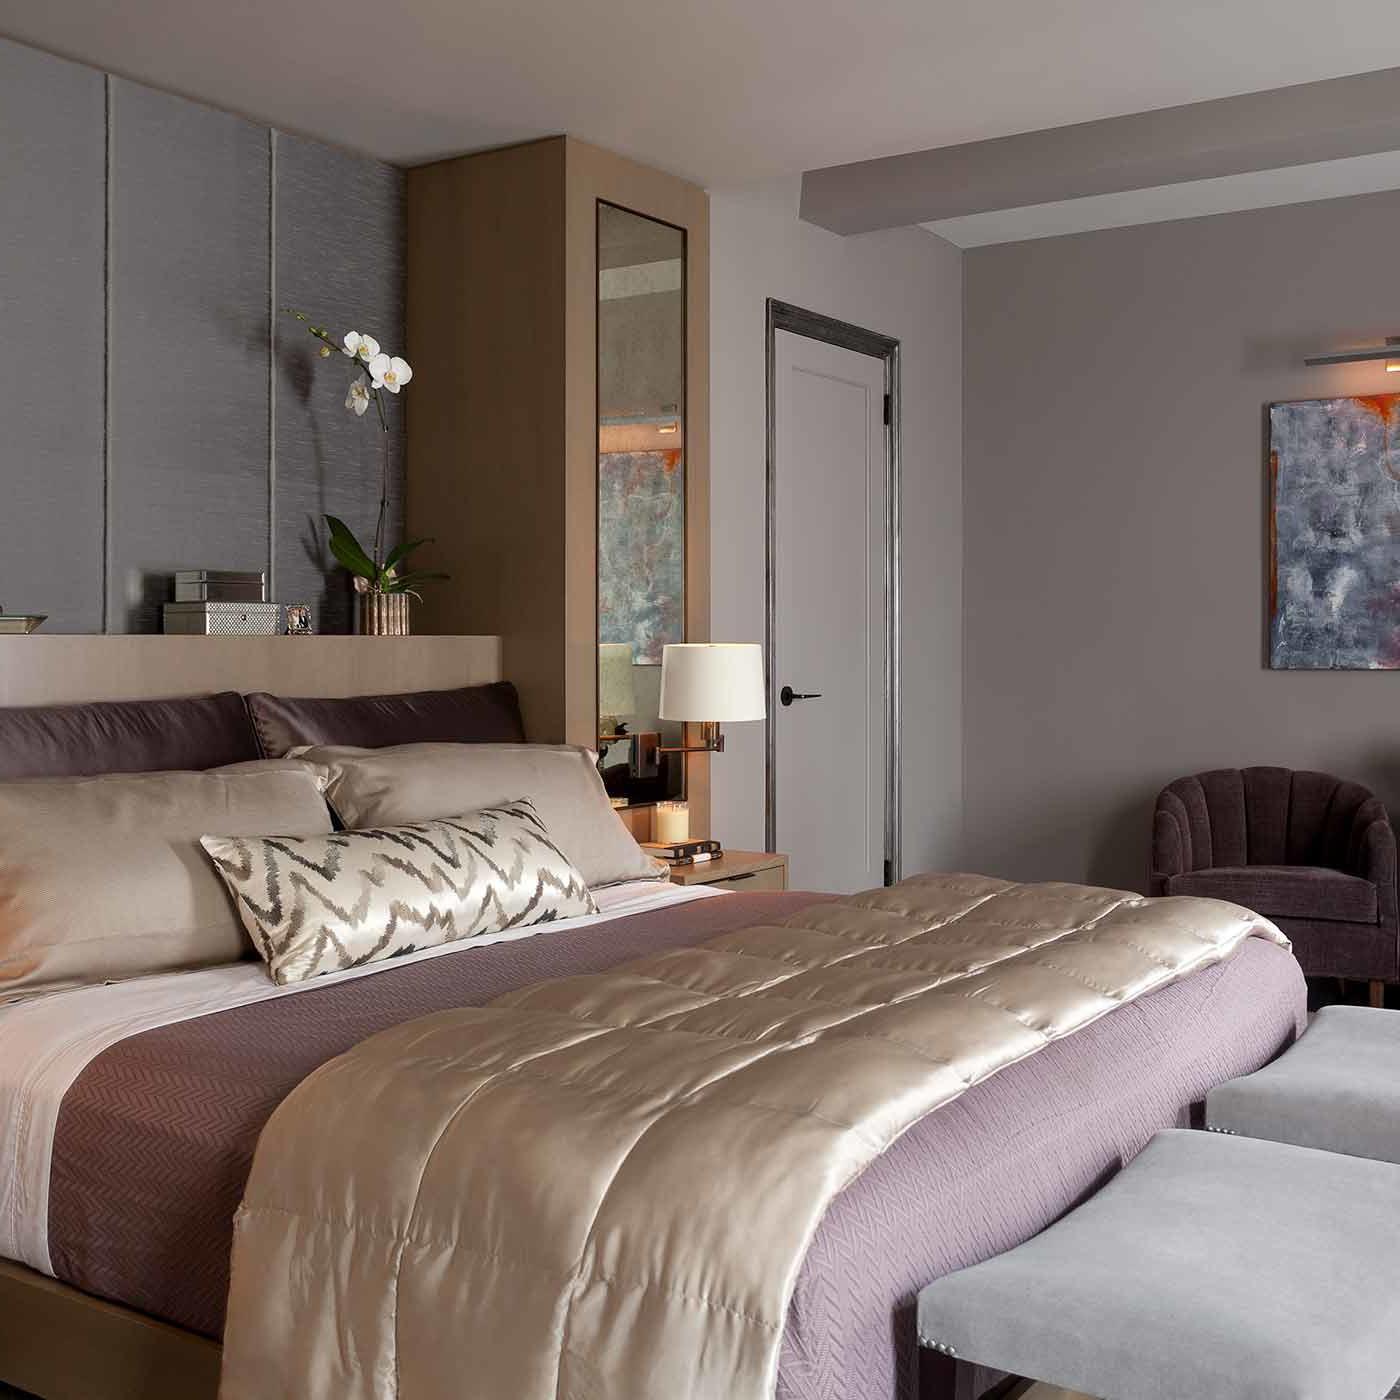 Contemporary pied-à-terre bedroom interior design by Darci Hether New York